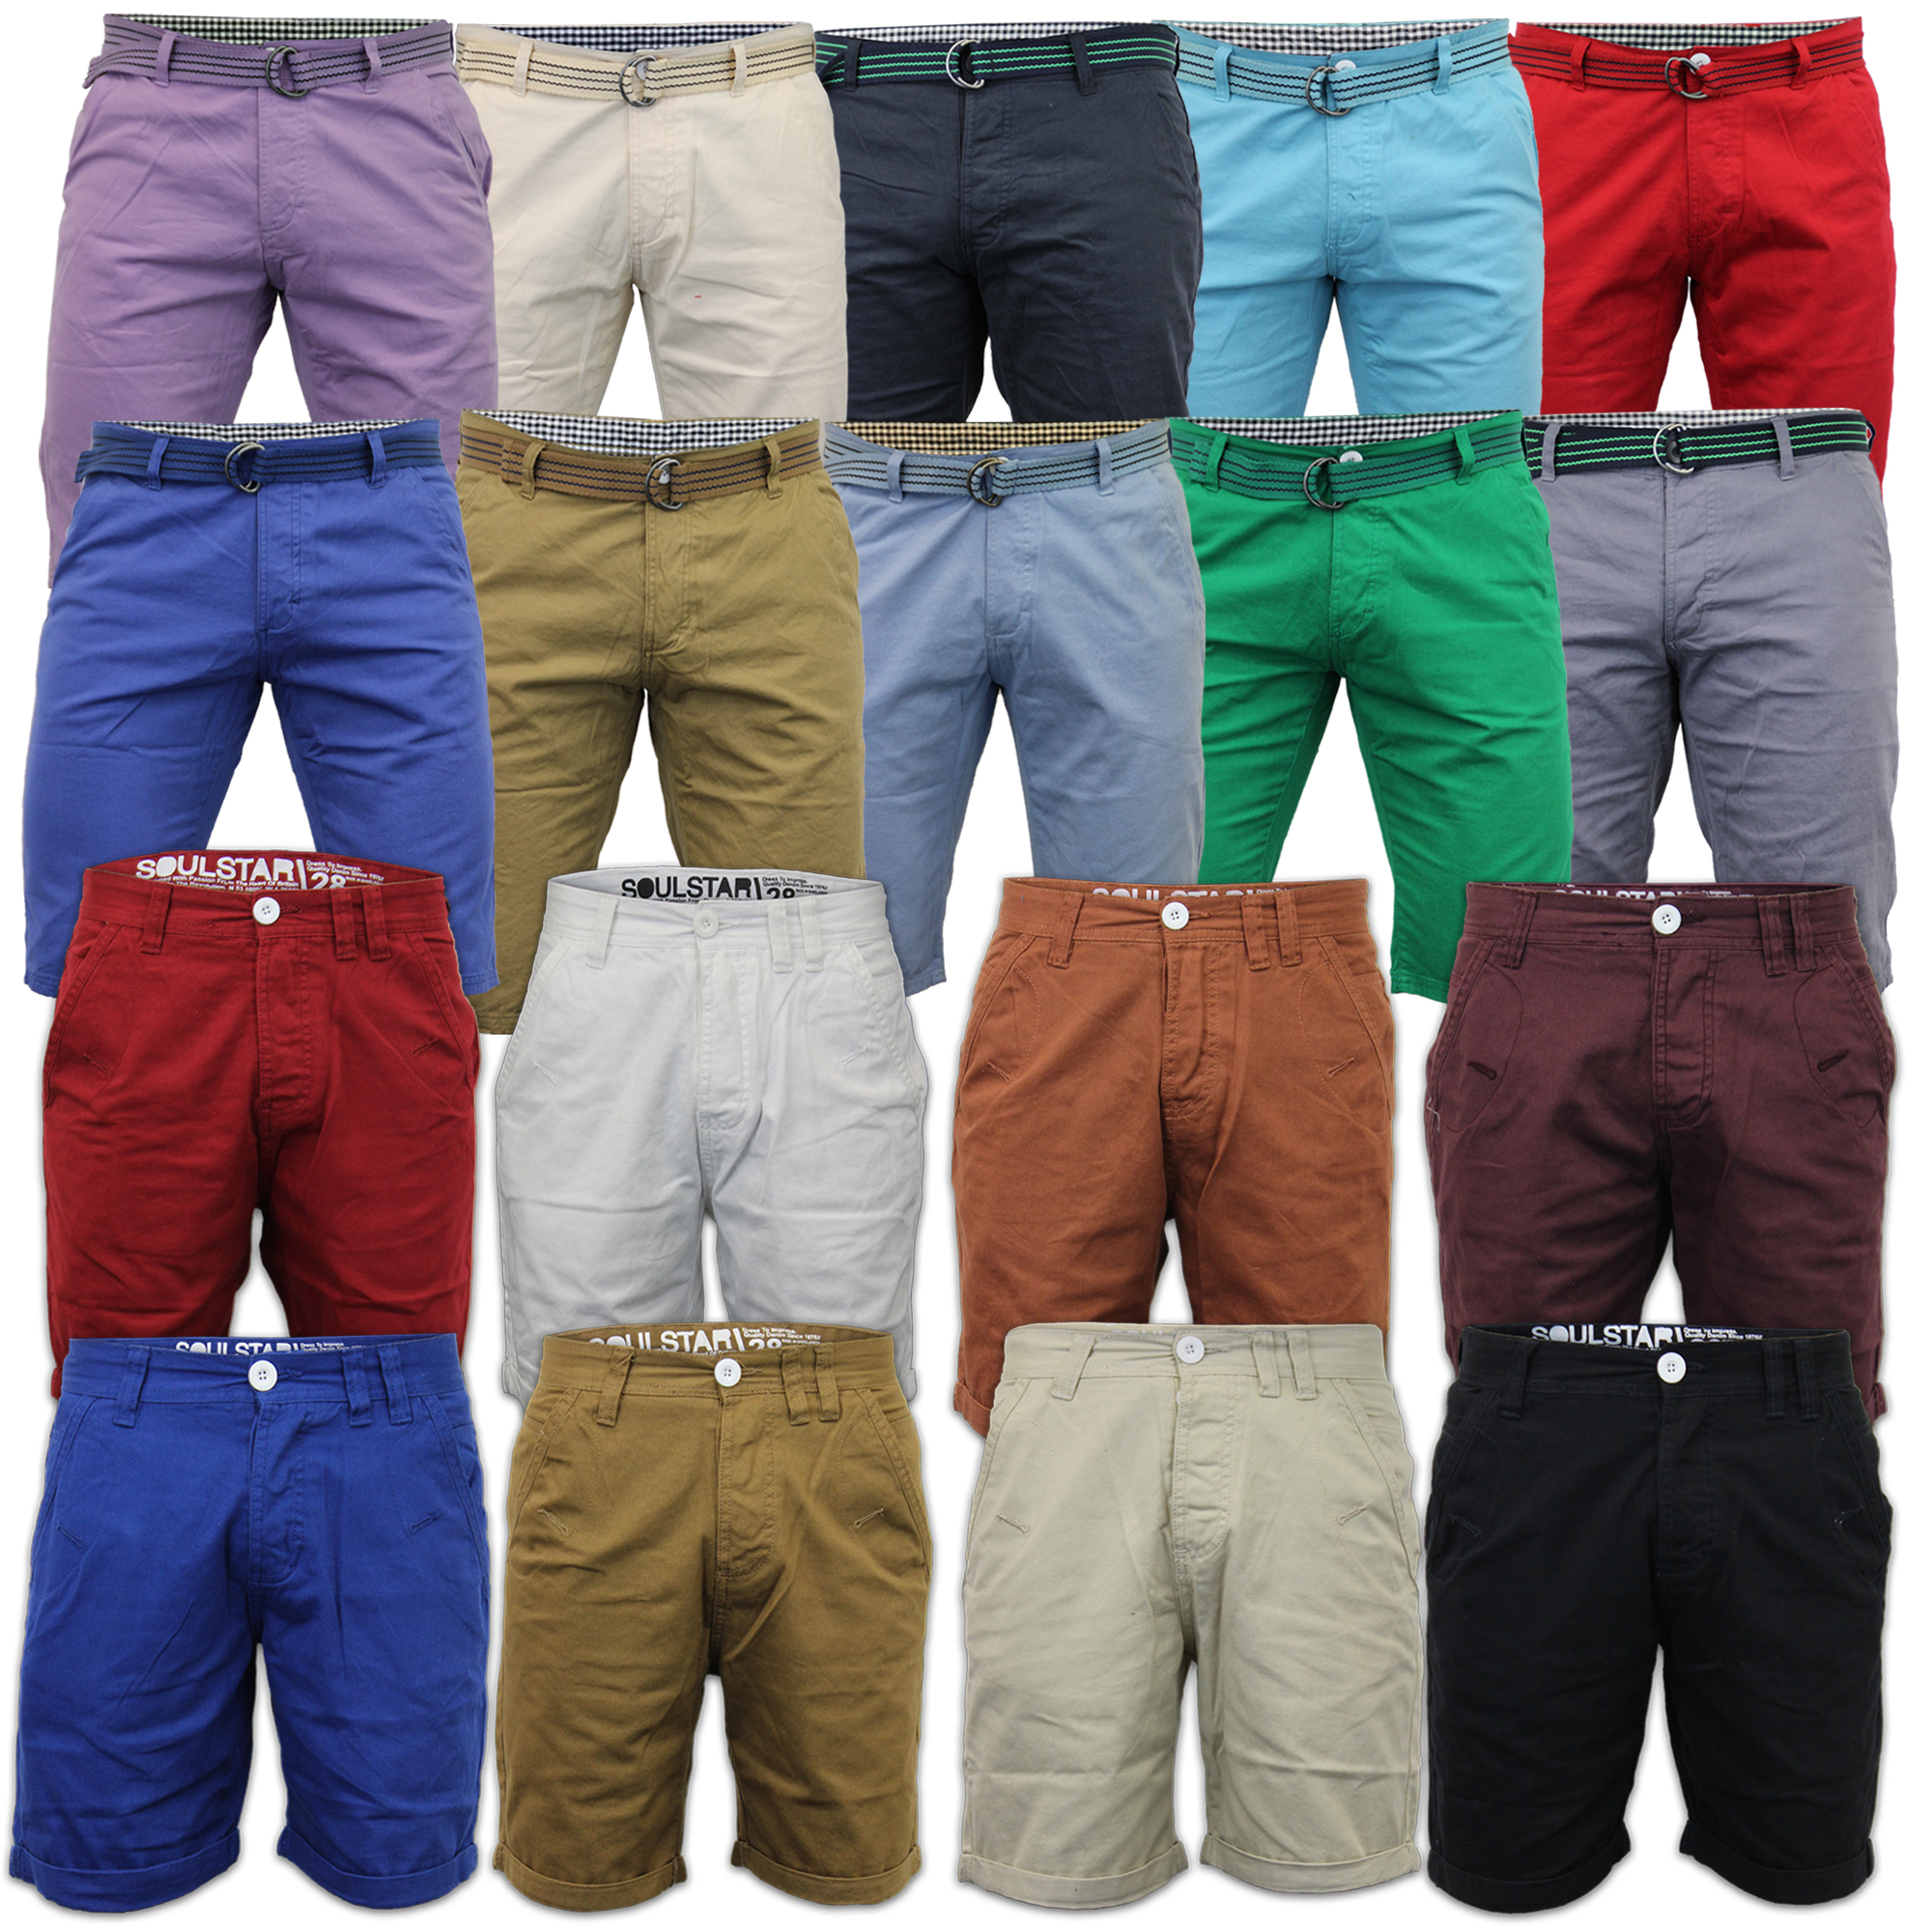 Boys Shorts Soul Star Kids Chino Summer Half Pants Roll Up Cotton ...